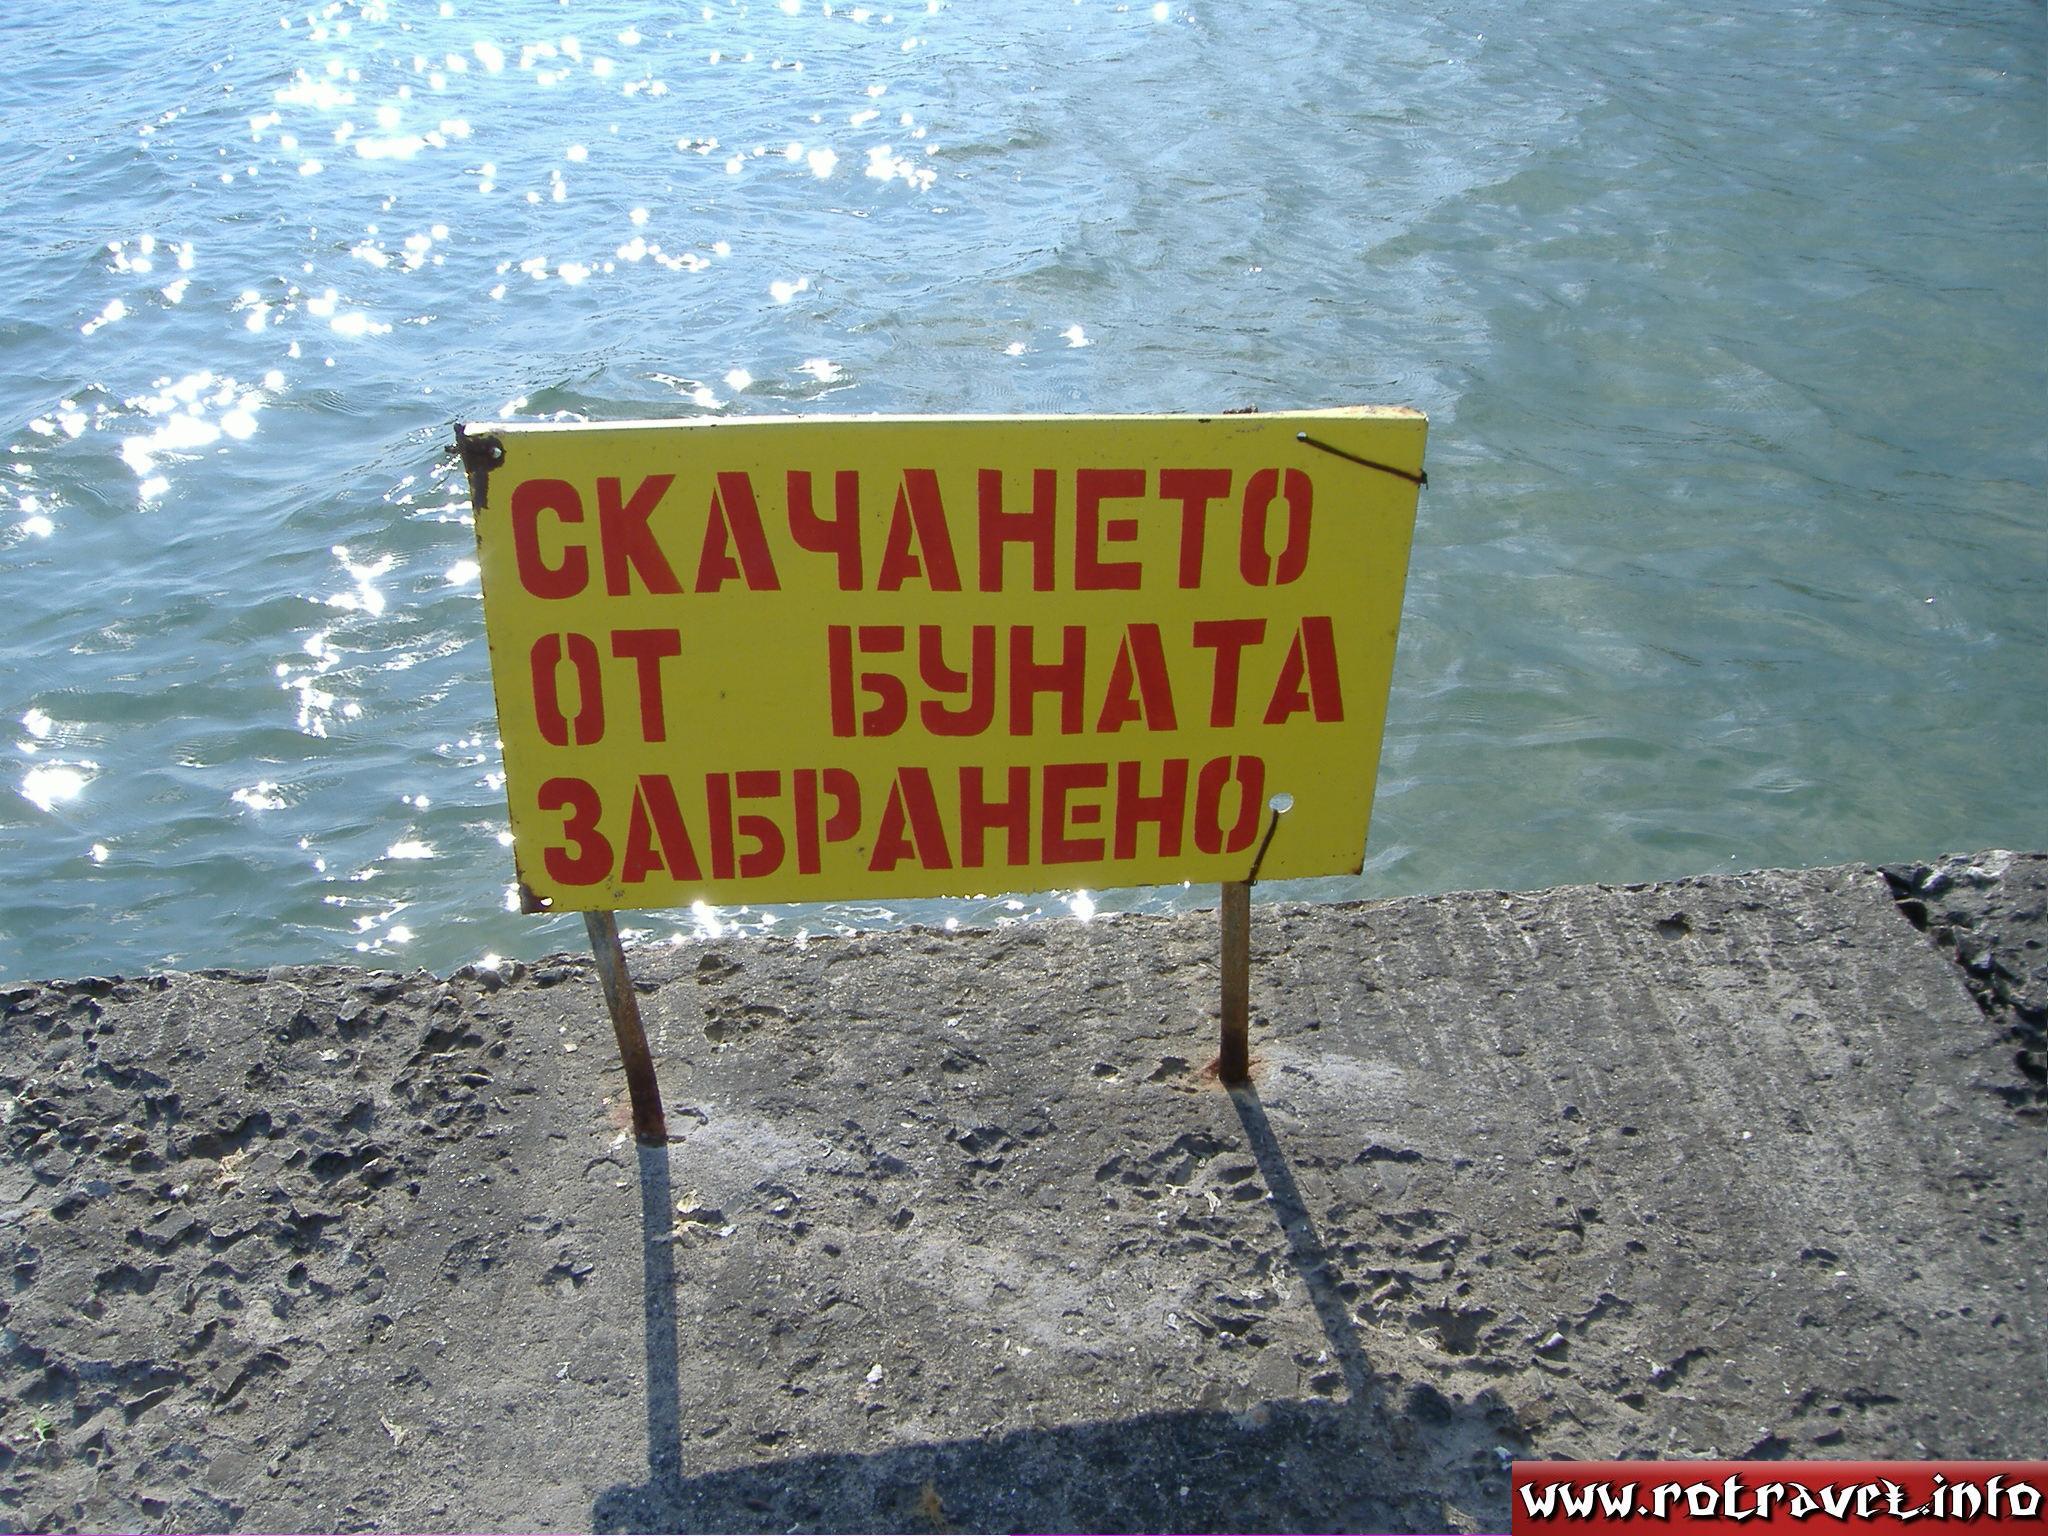 """Swimming forbidden"" SHARKS !!!  (joke) :P"